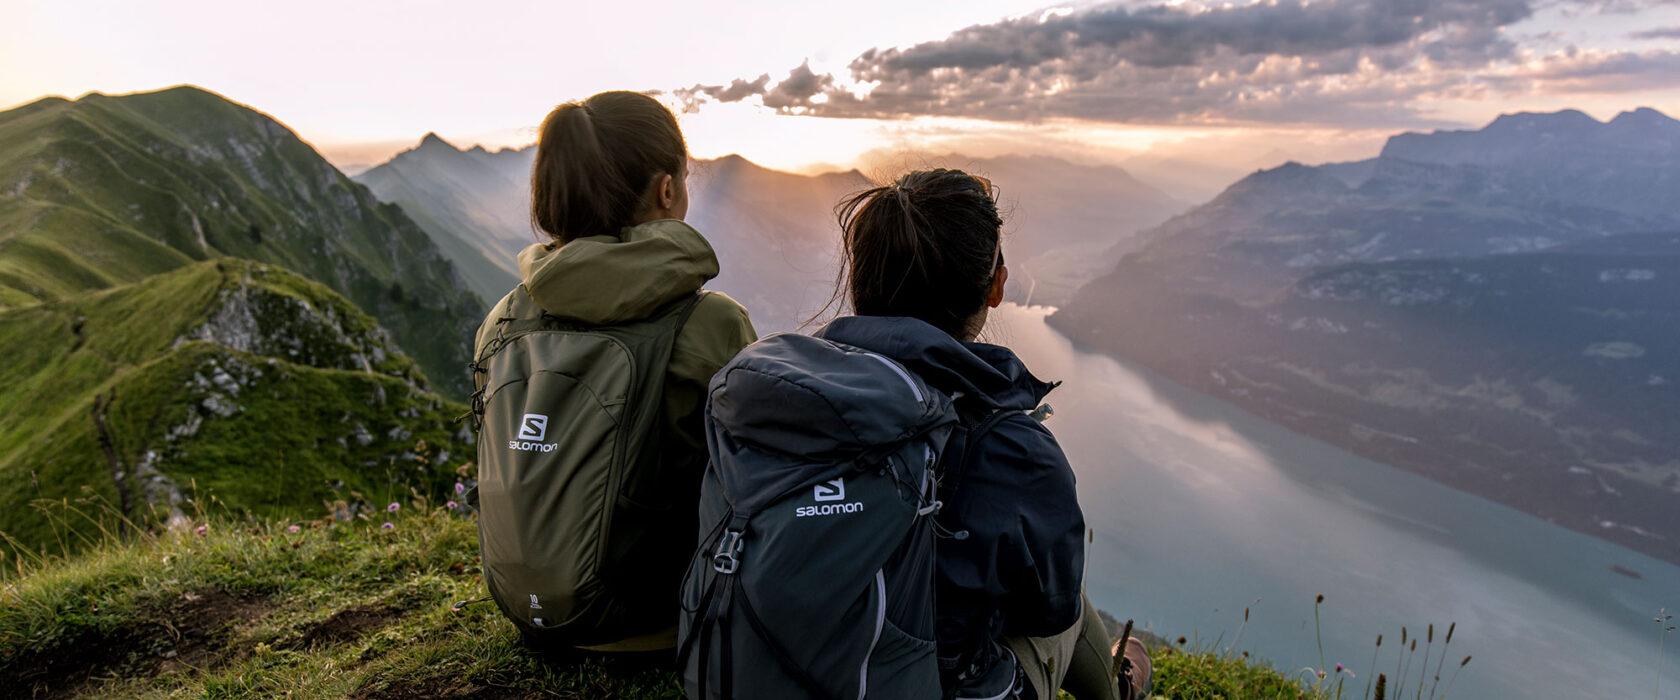 Hiking-Buddies